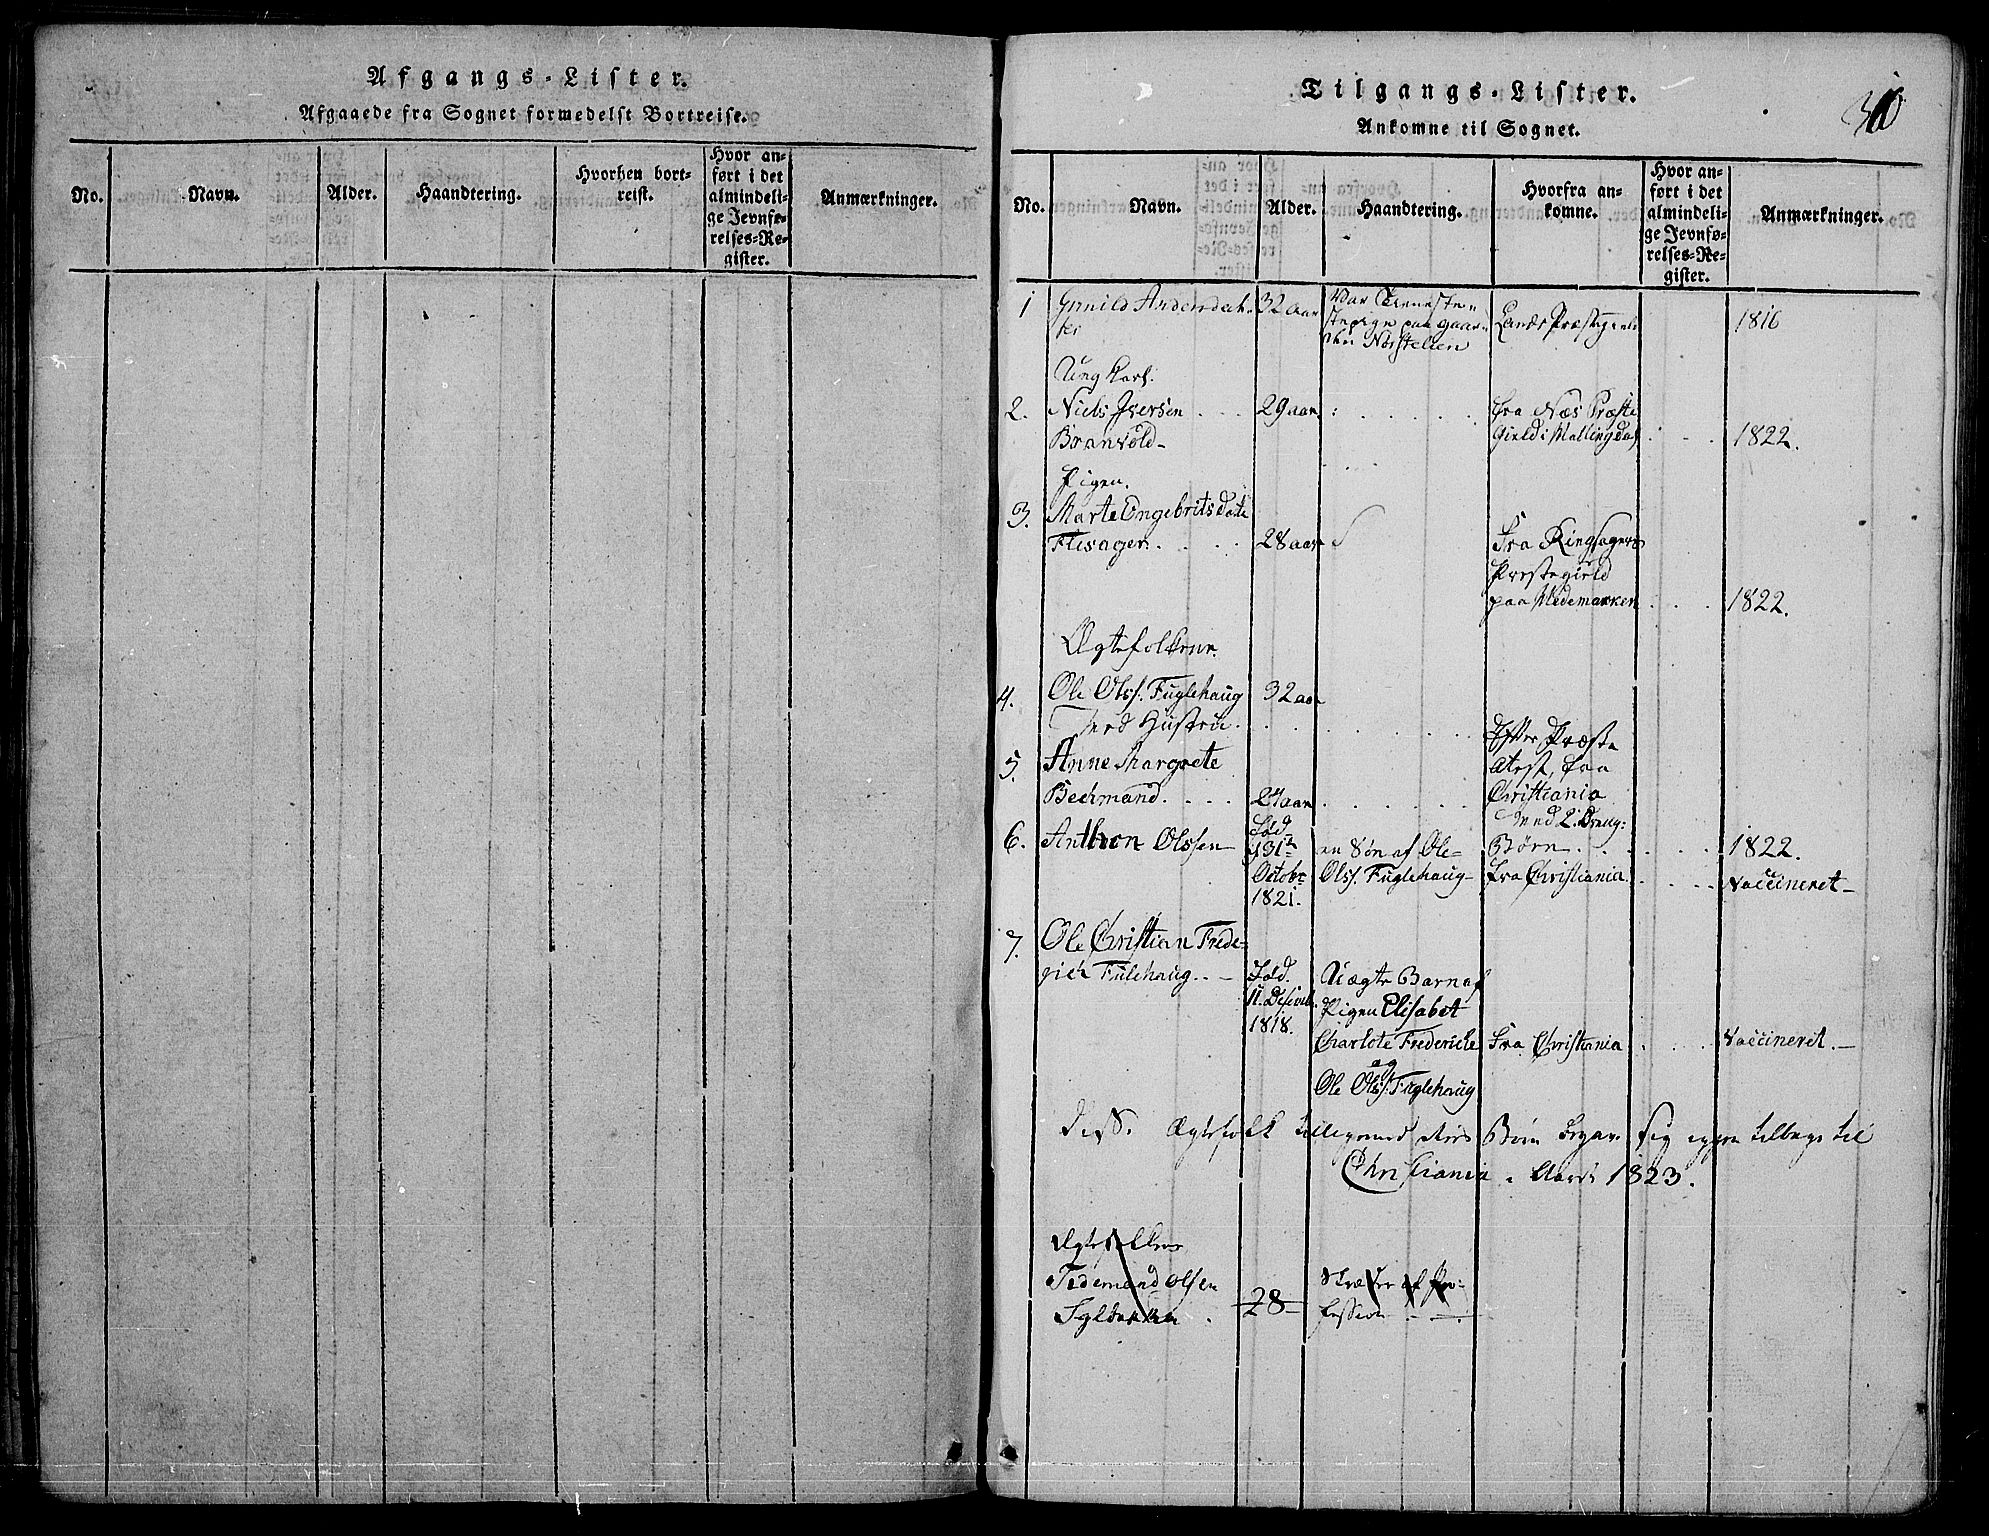 SAH, Nord-Aurdal prestekontor, Ministerialbok nr. 2, 1816-1828, s. 310